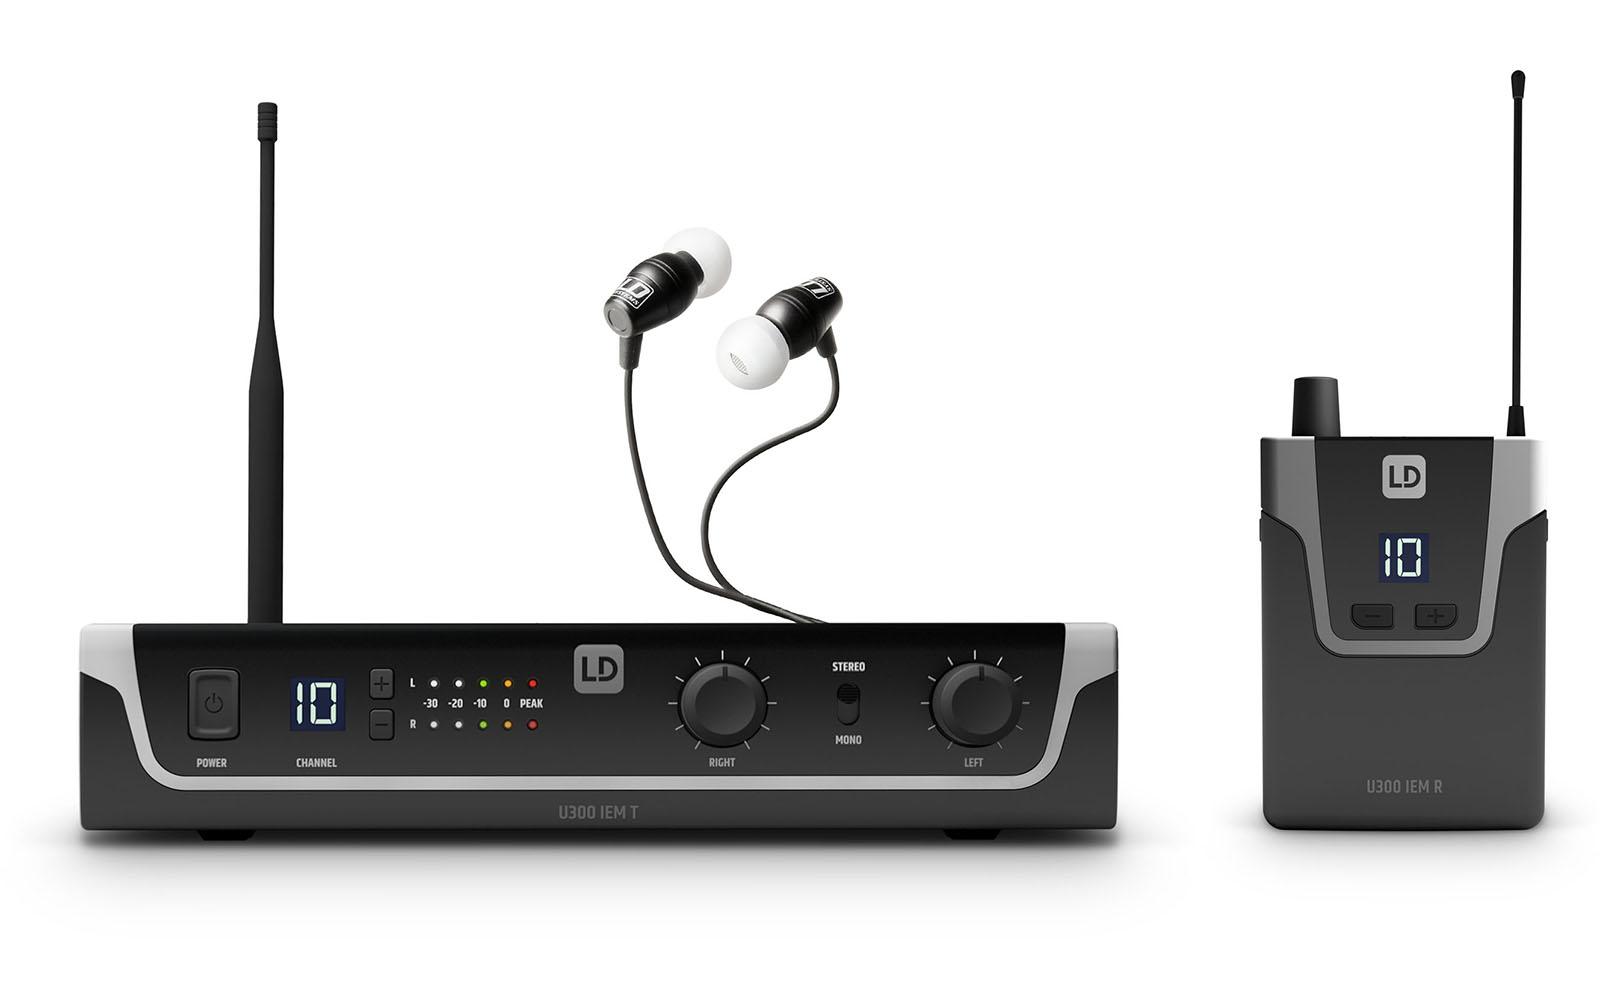 ld-systems-u306-iem-hp-in-ear-monitoring-system-mit-ohrha-rern